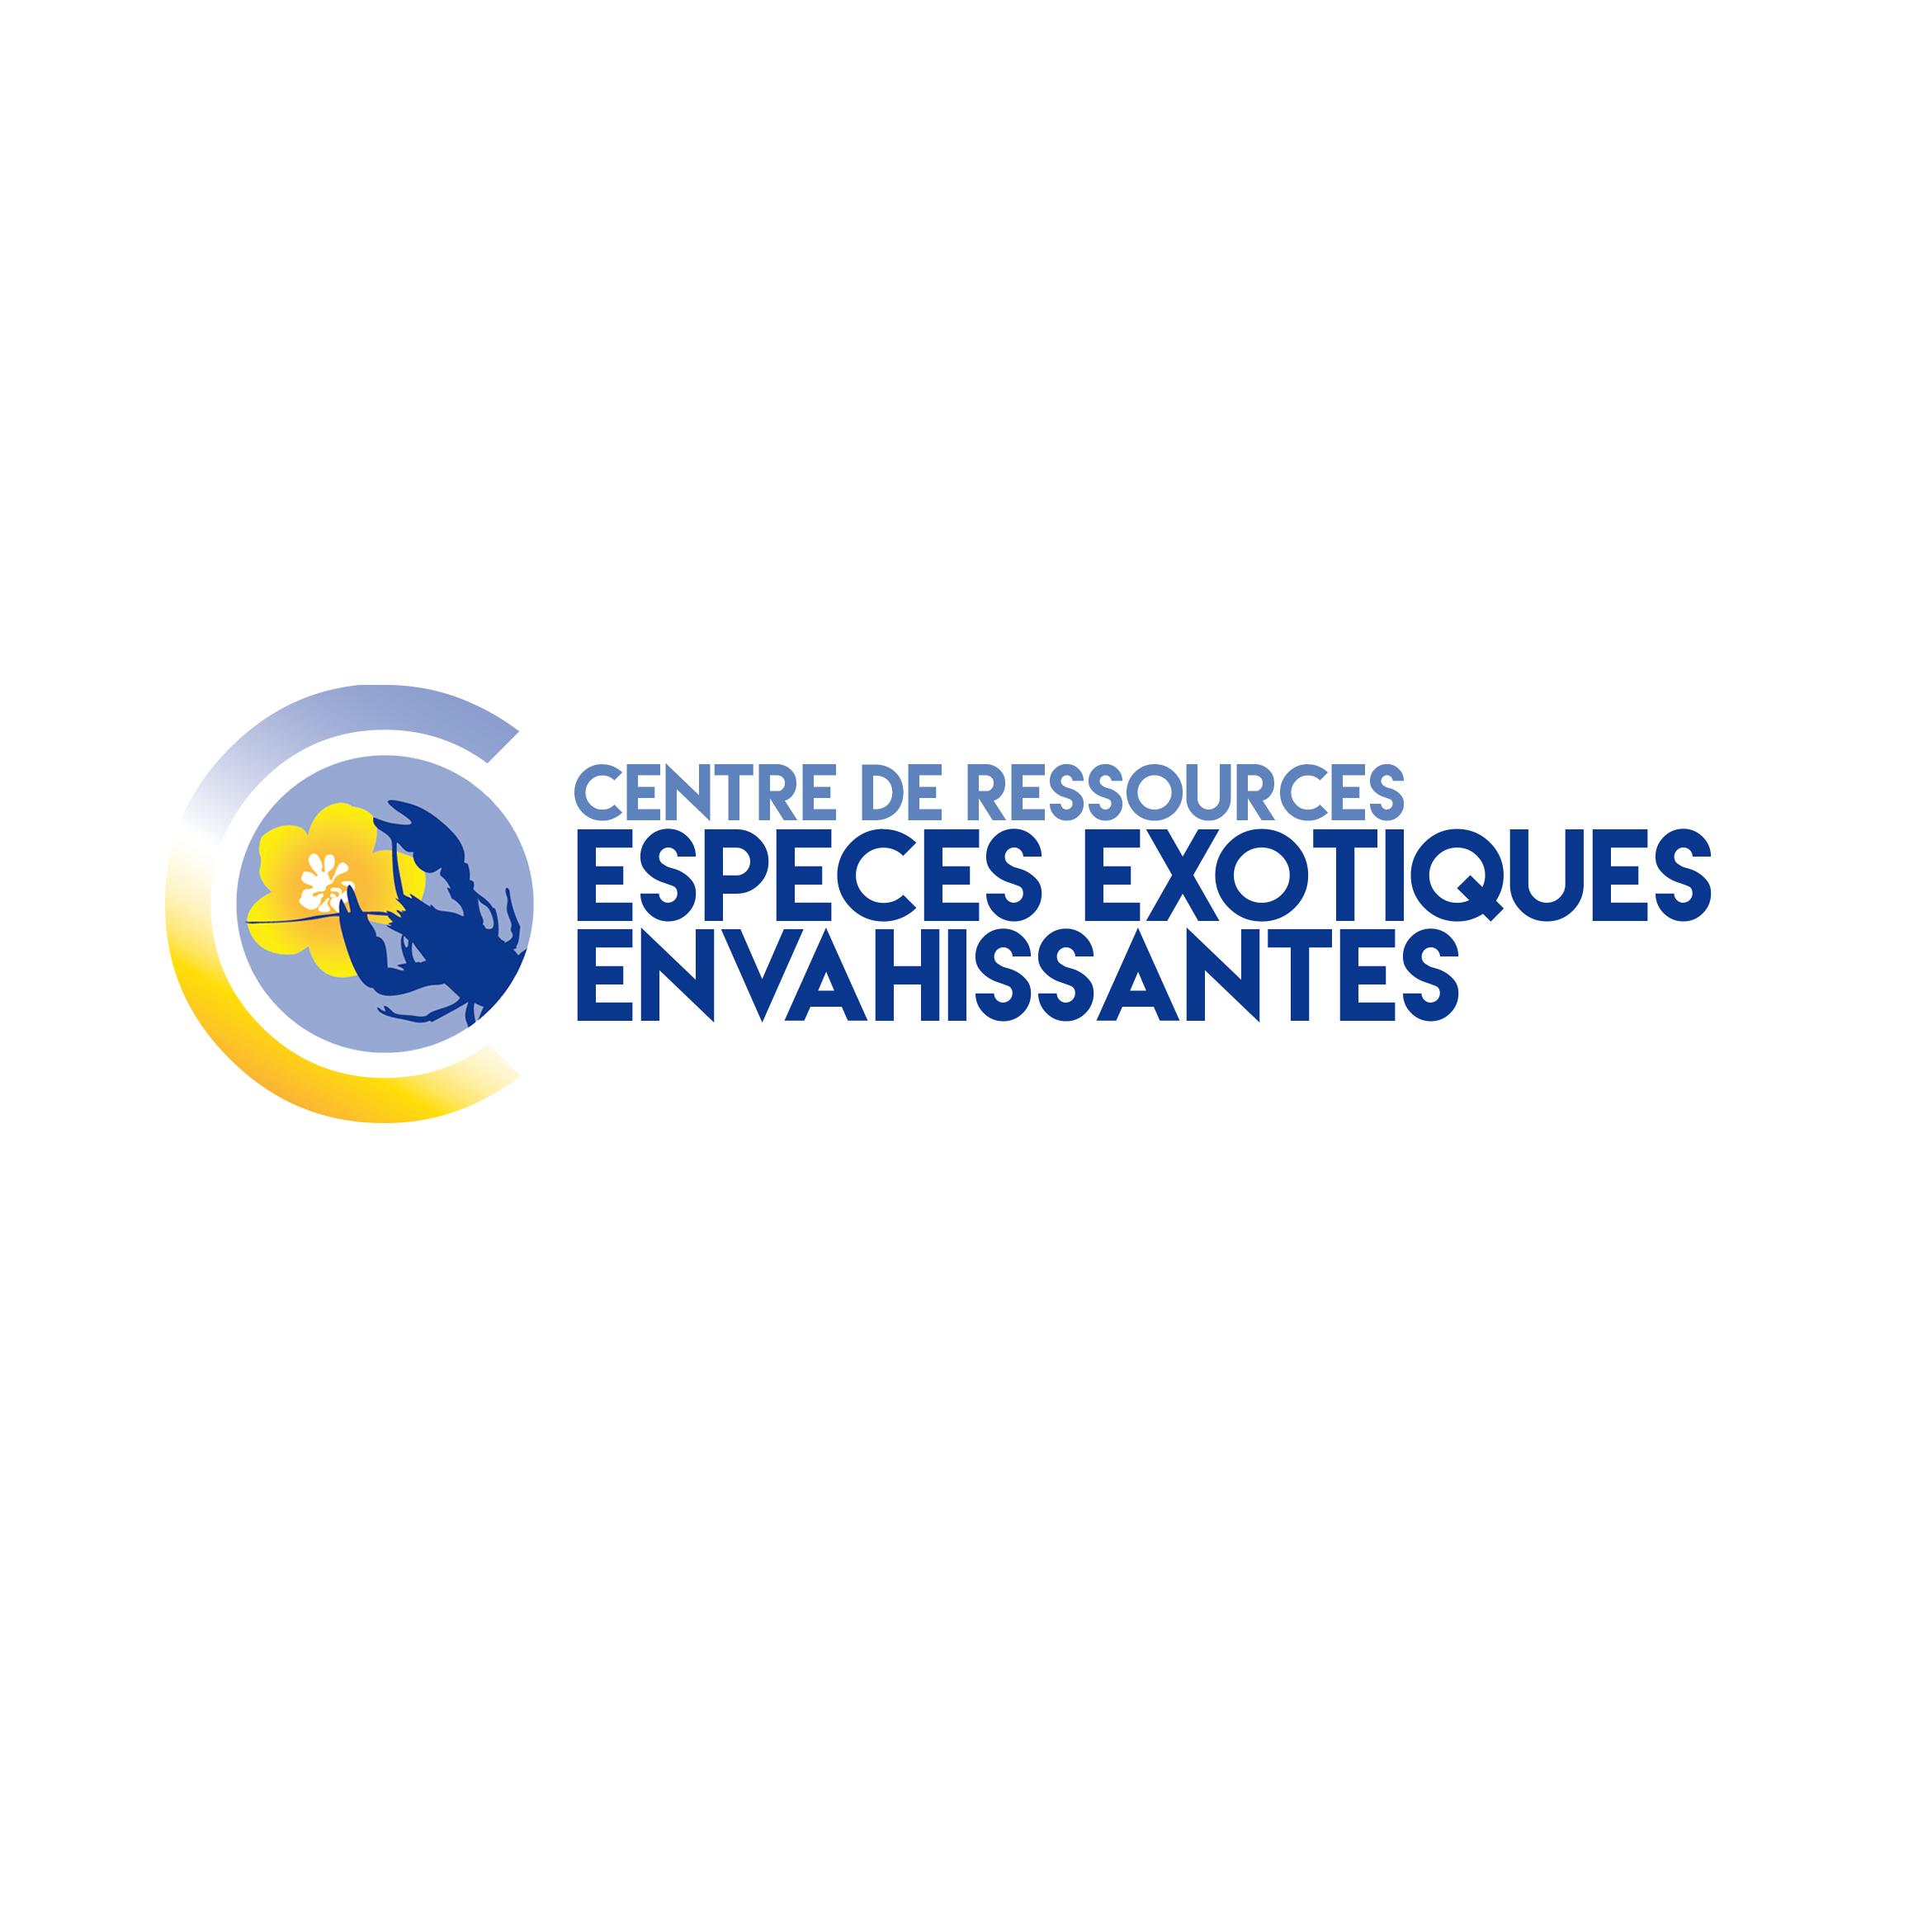 Centre de ressources EEE national